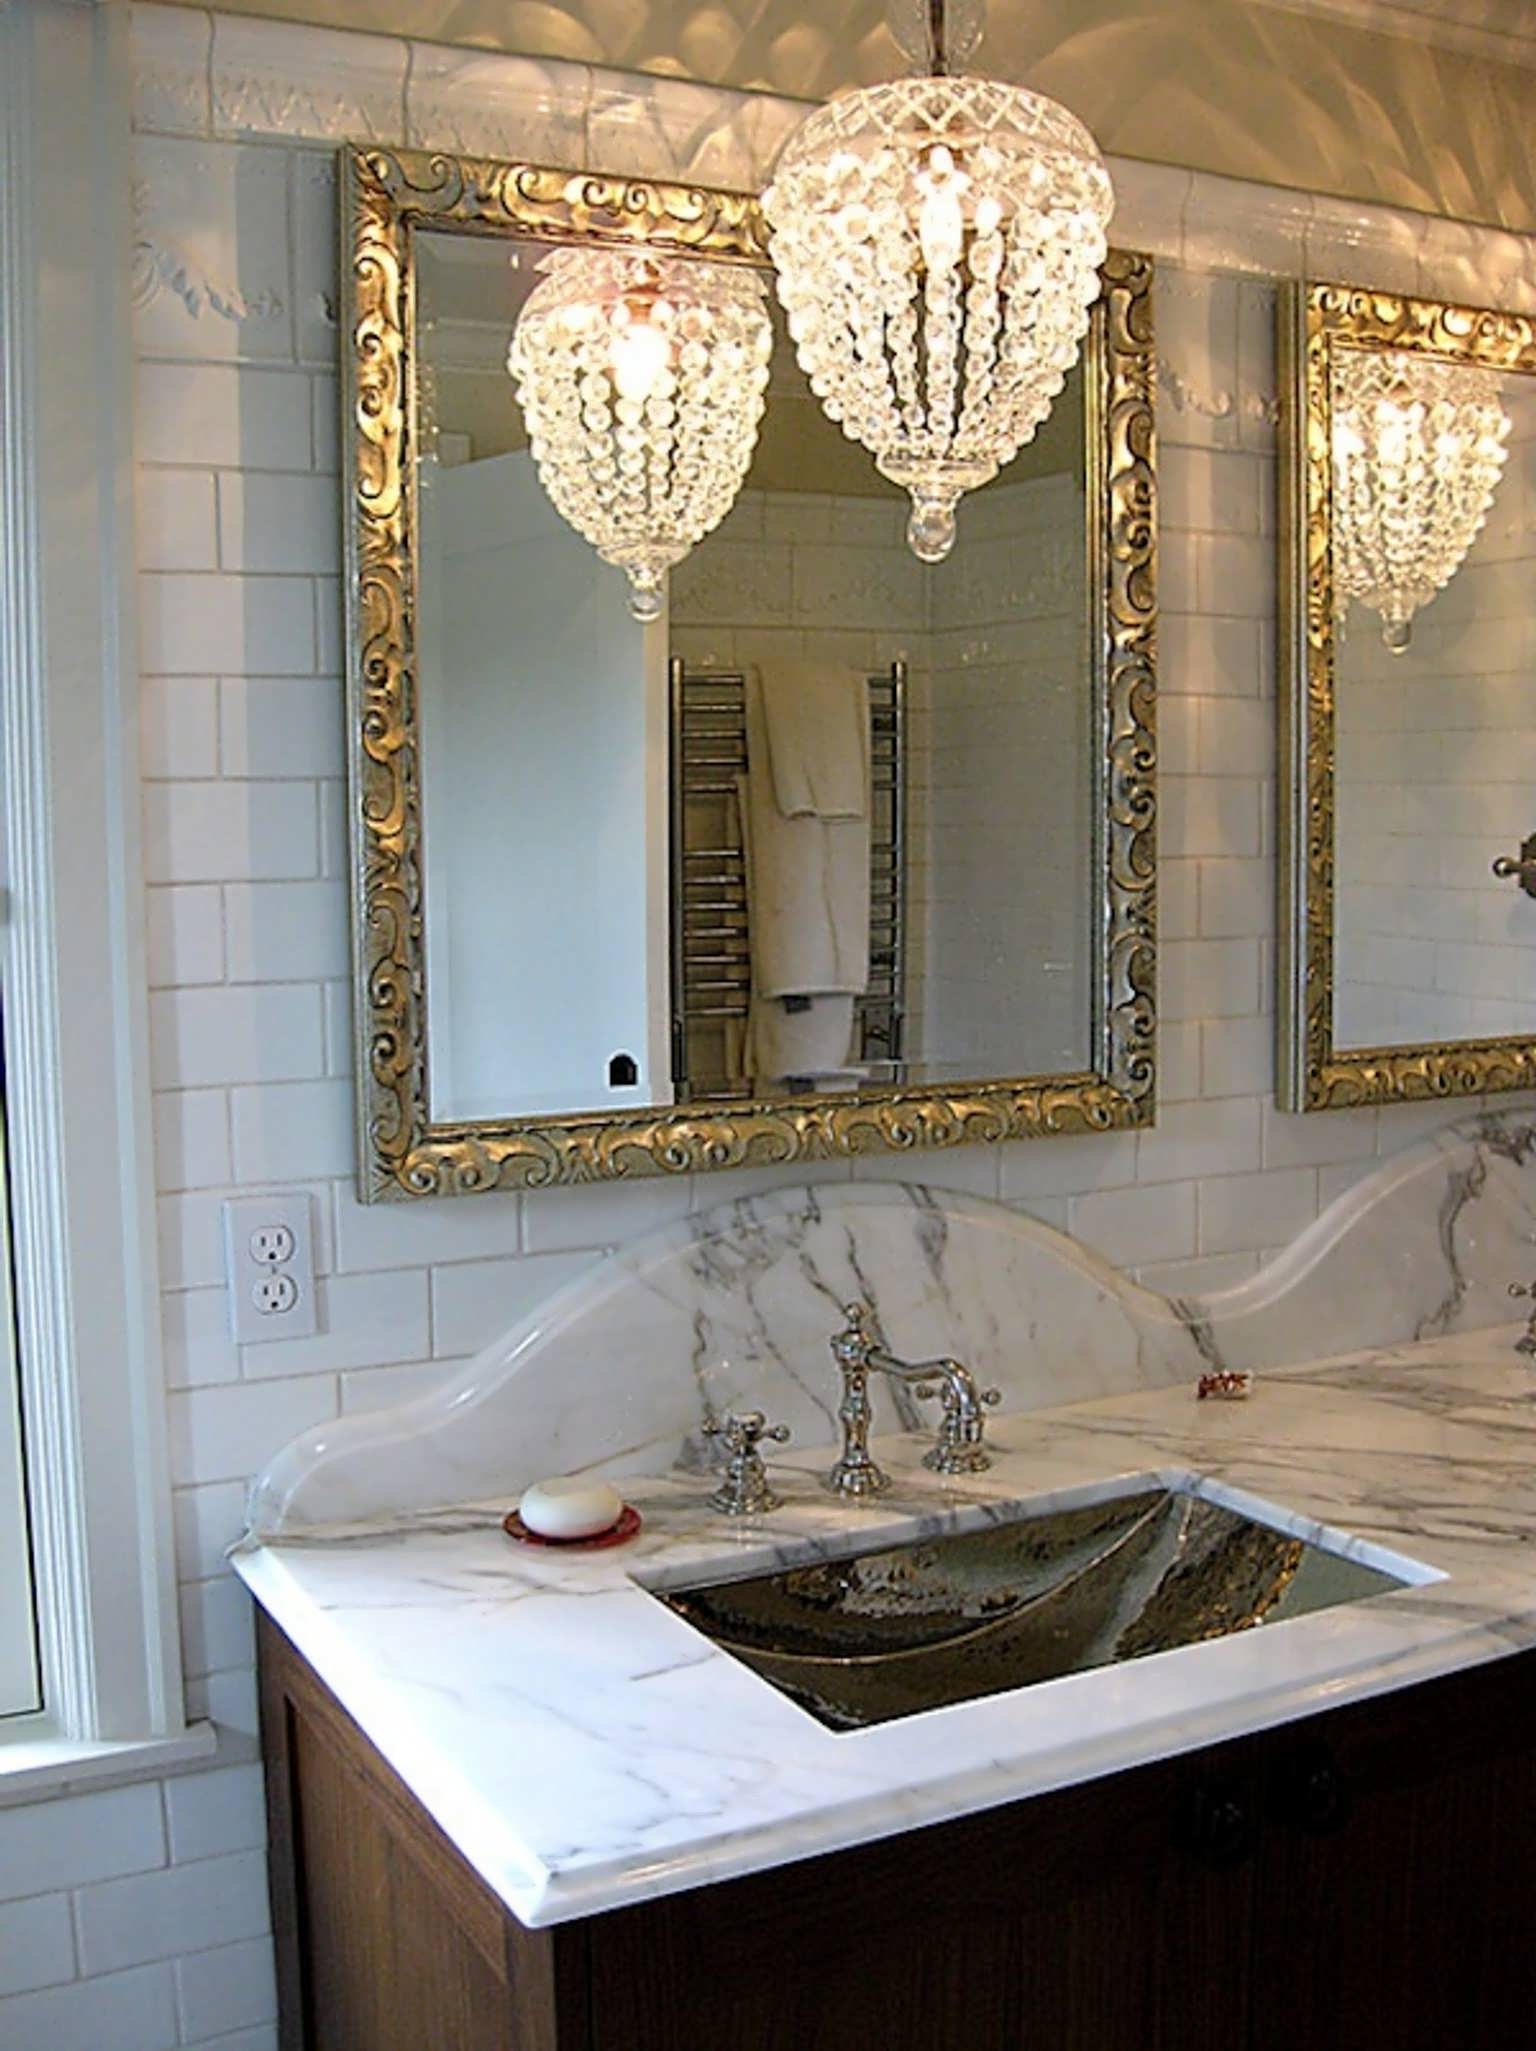 Best And Newest Bathroom Chandelier Lighting Throughout Chandelier : Bathroom Chandelier Lighting Black Mini Chandelier (View 15 of 20)